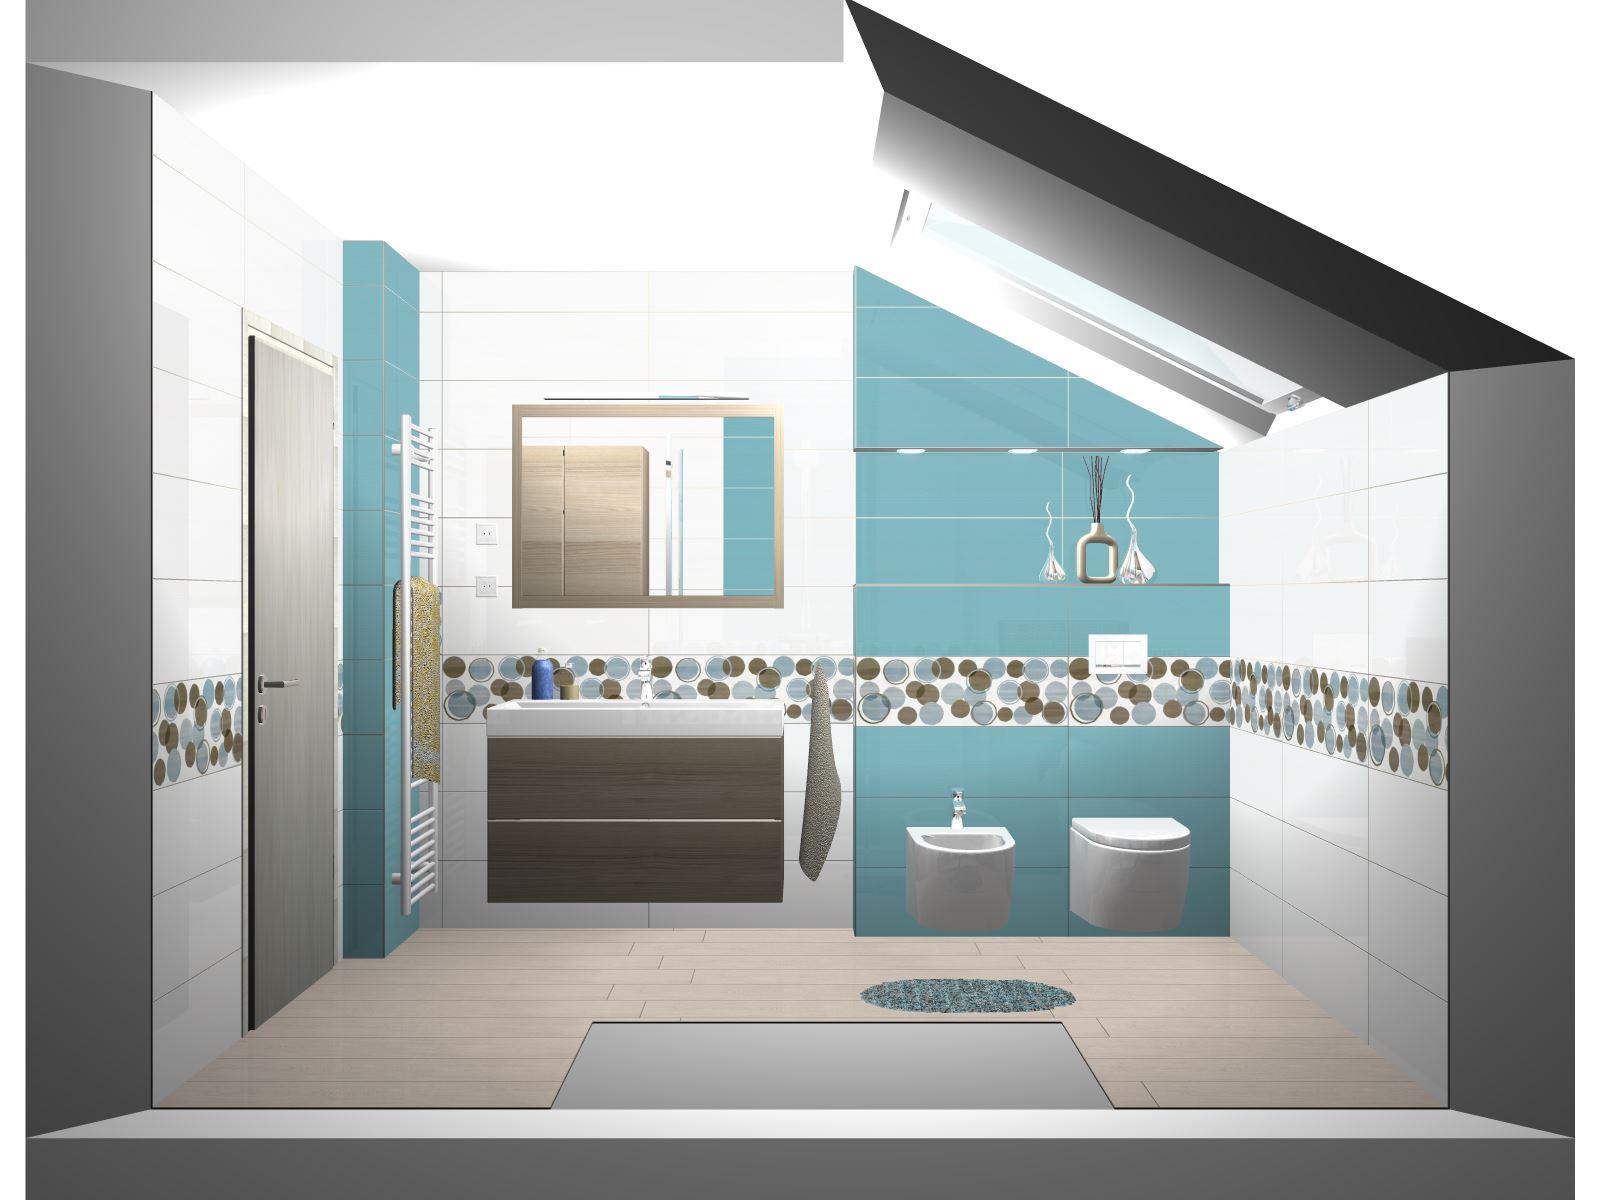 armonia tresor bathroom by pirman romana trgocev d o o on visoft360 portal. Black Bedroom Furniture Sets. Home Design Ideas